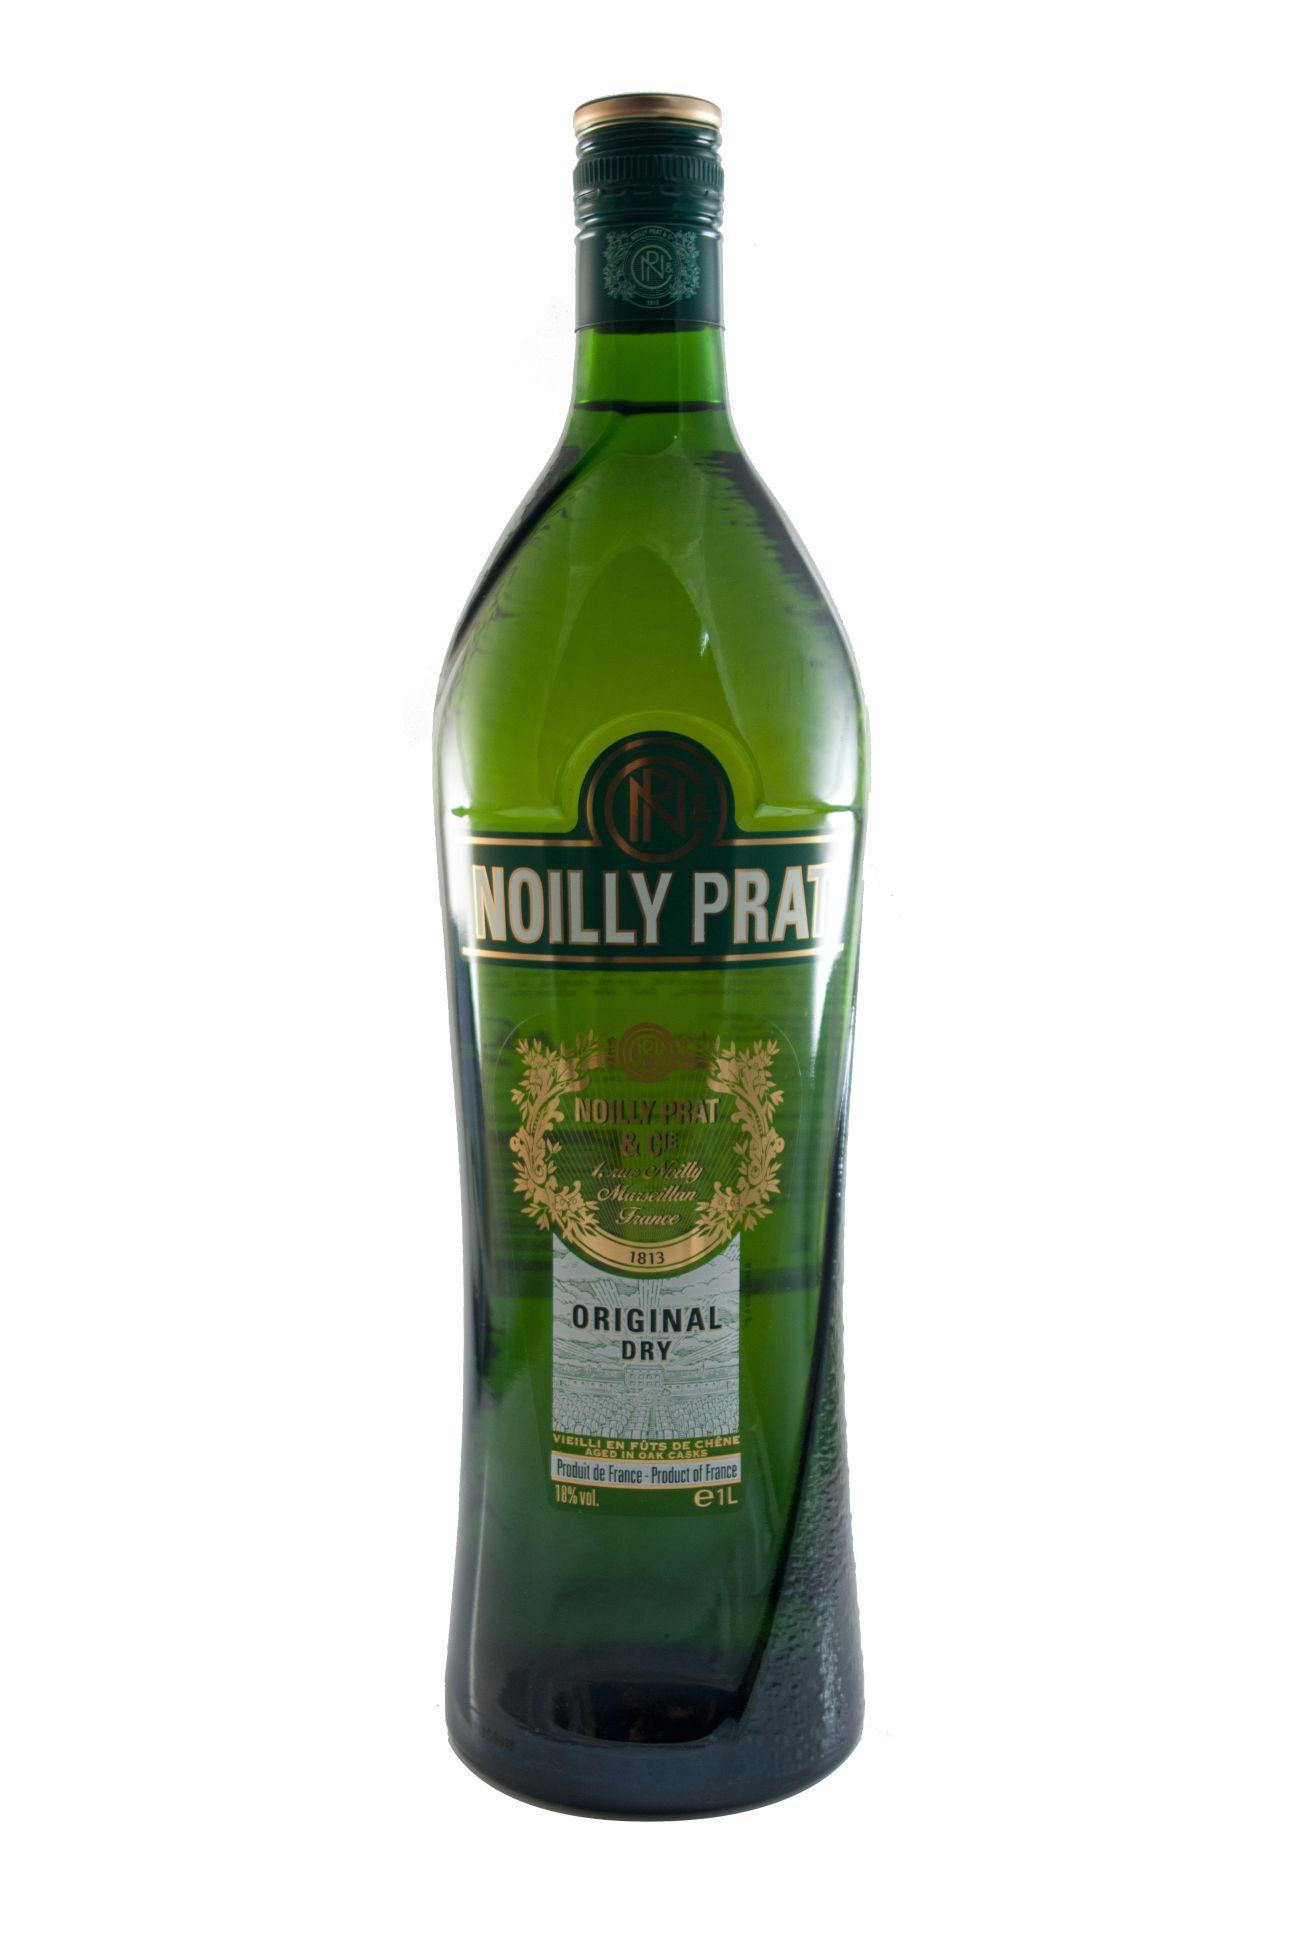 noilly prat original dry vermouth 1 liter kaufen ab 11 58. Black Bedroom Furniture Sets. Home Design Ideas